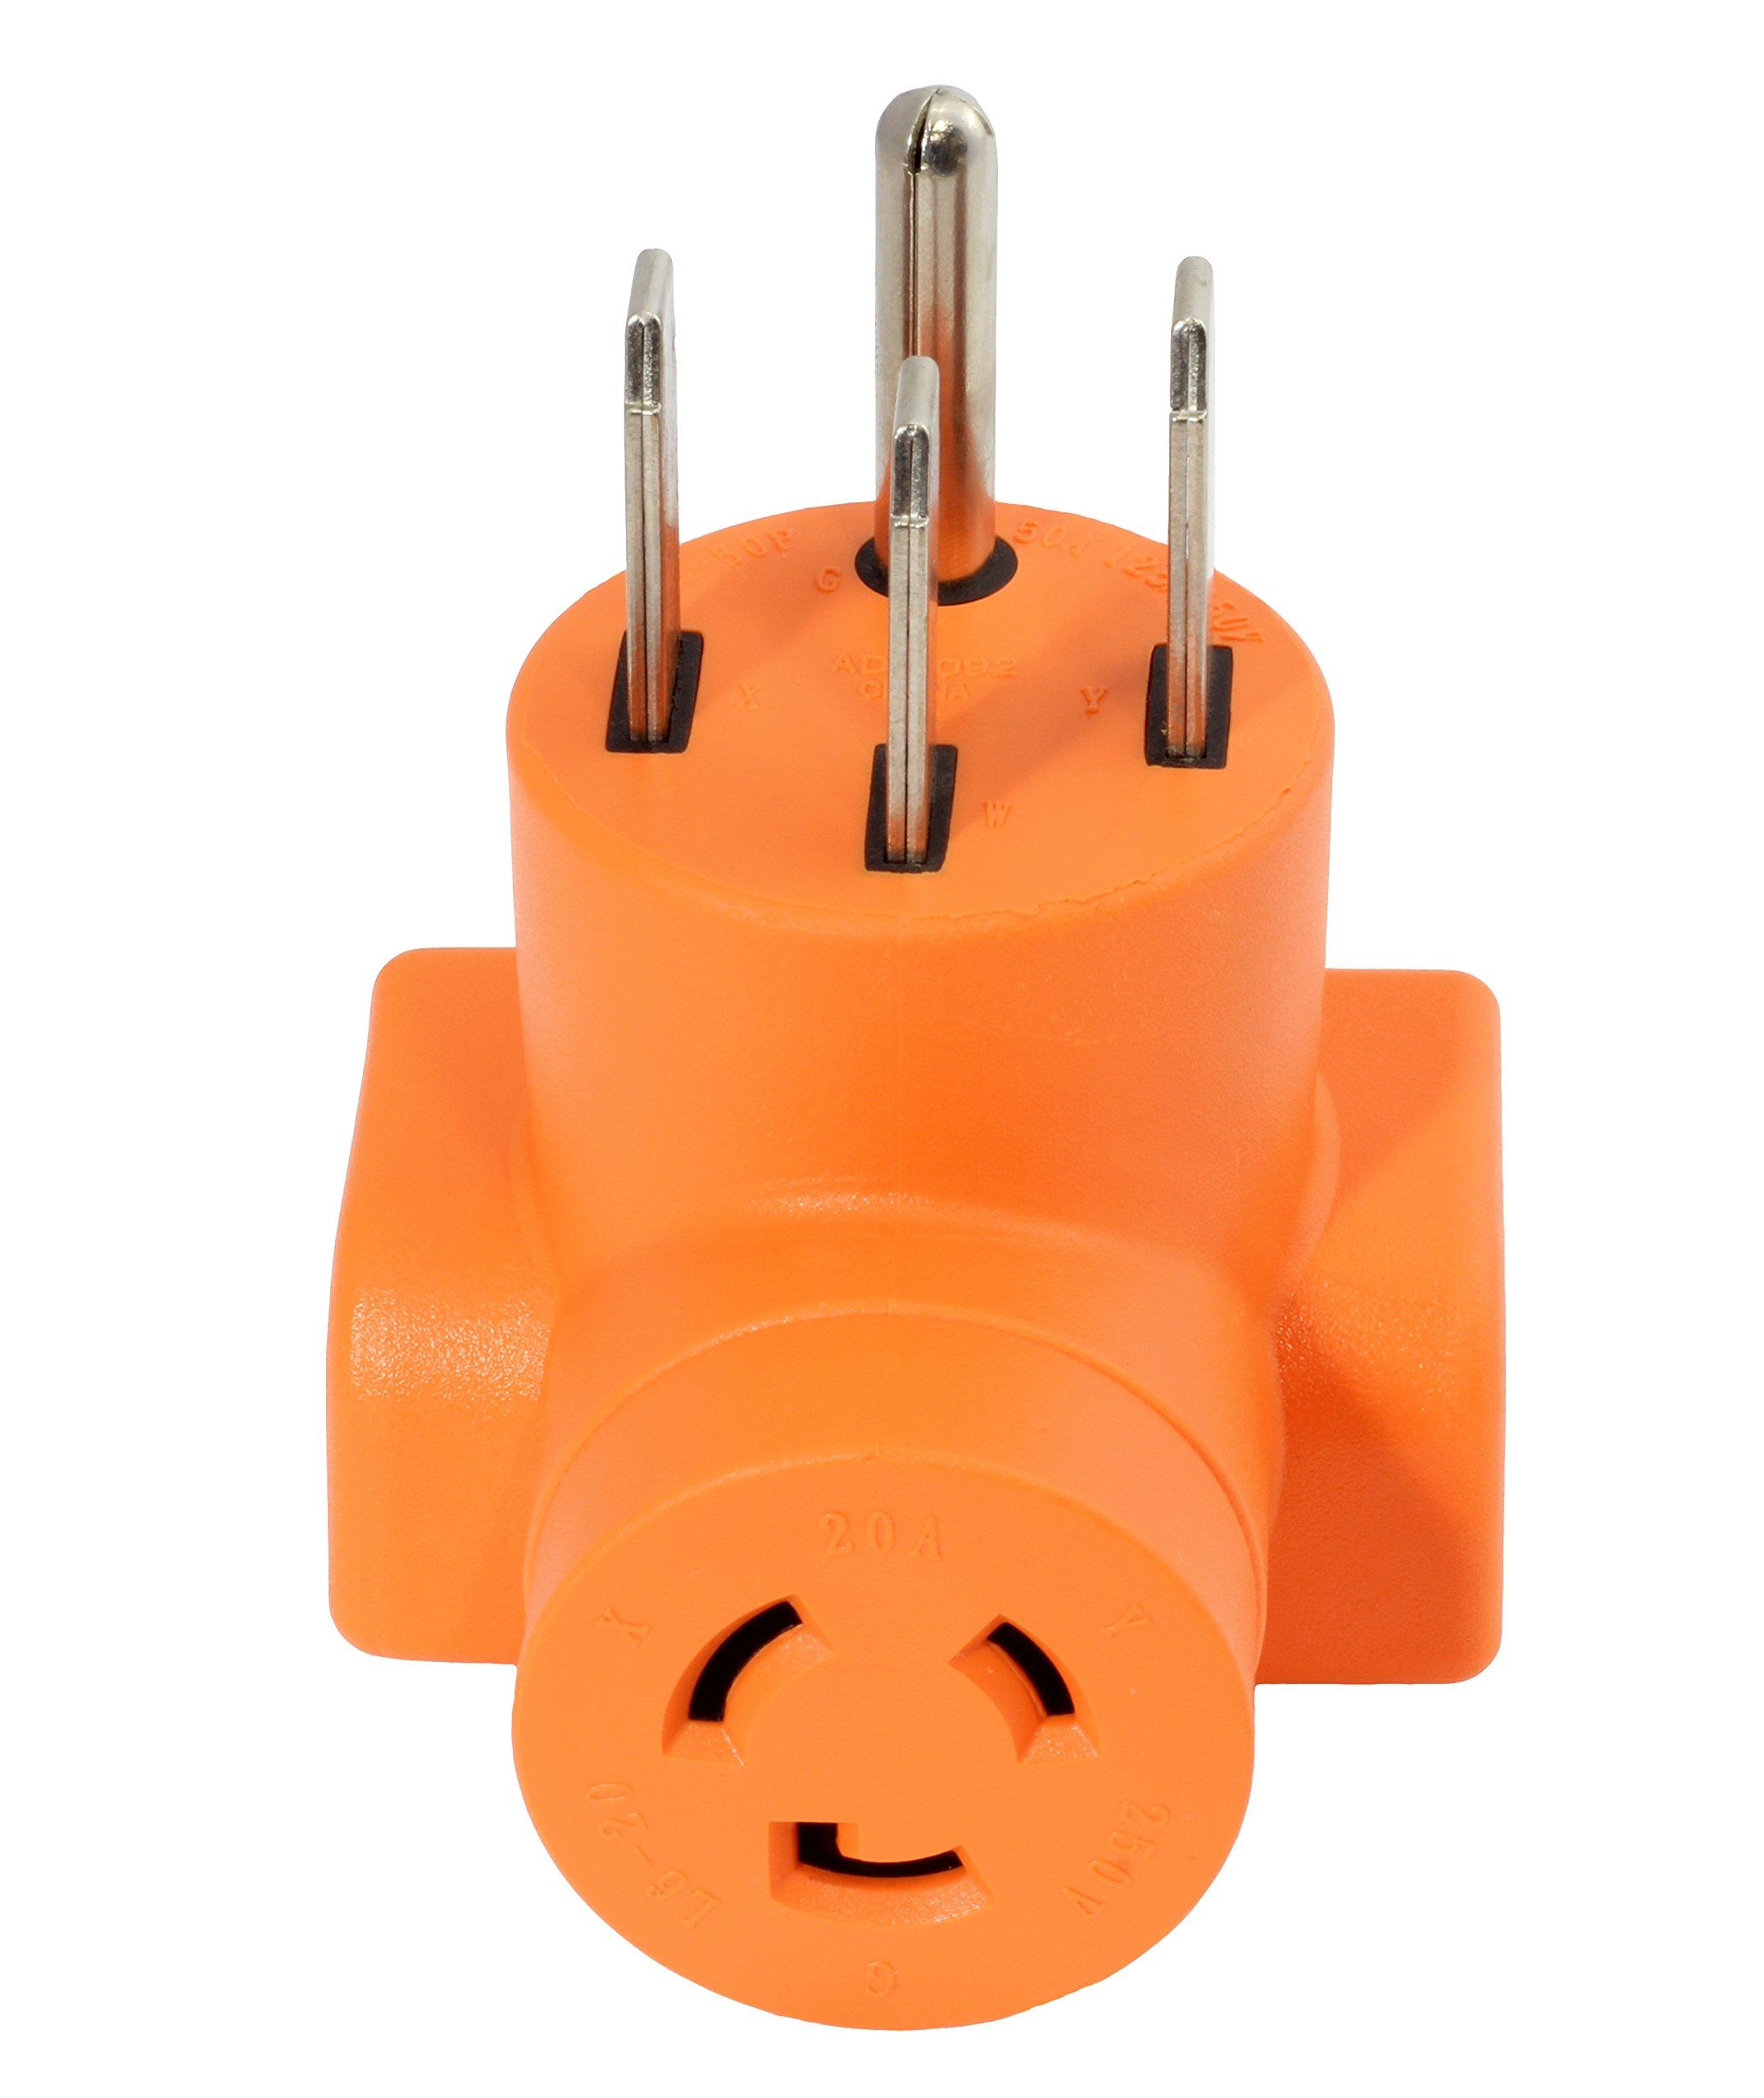 AC WORKS [AD1450L620] Plug Adapter NEMA 14-50P 50Amp 125/250Volt Range/RV/Generator Power Plug to NEMA L6-20R 20Amp 250Volt Locking Female Connector Adapter